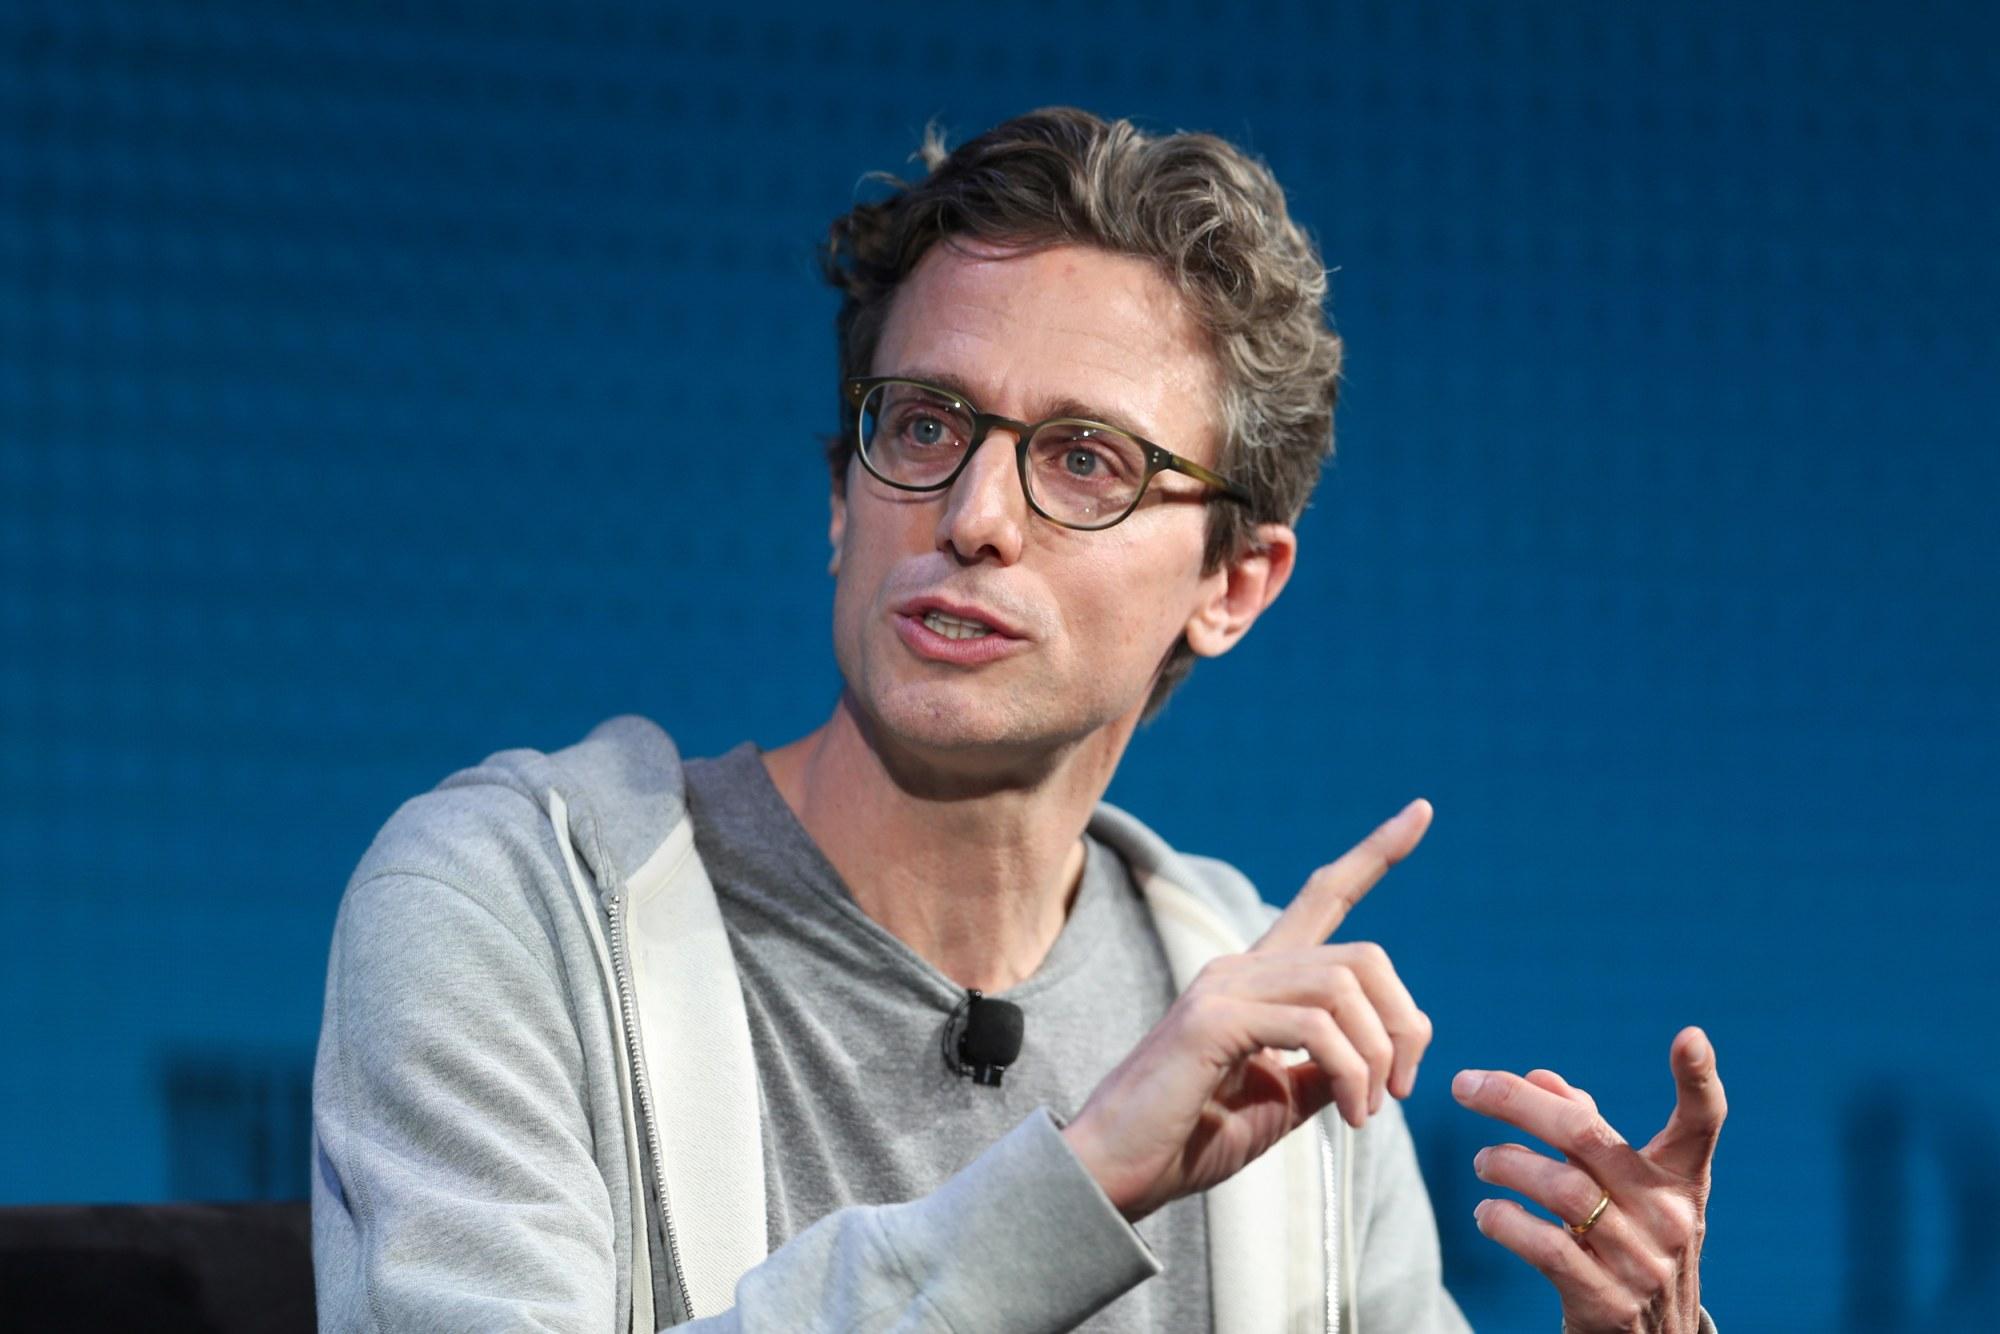 BuzzFeed Announces Plans To Go Public